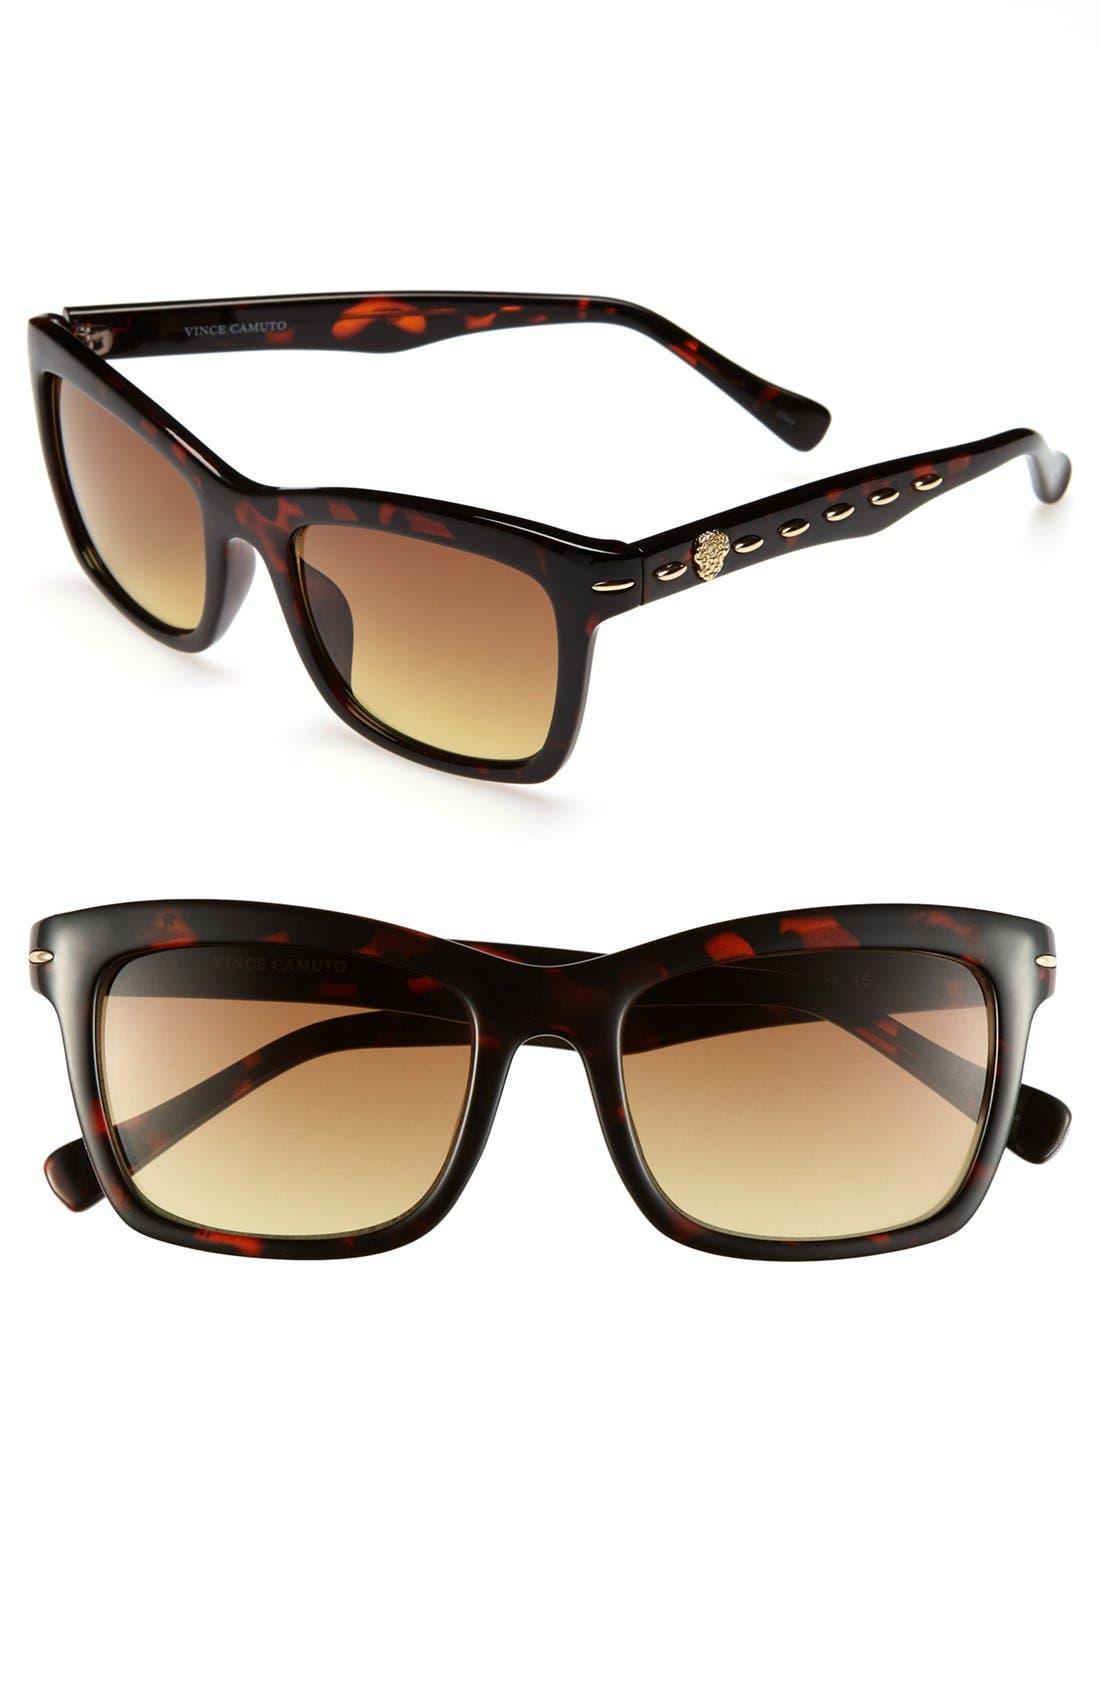 Main Image - Vince Camuto 53mm Sunglasses